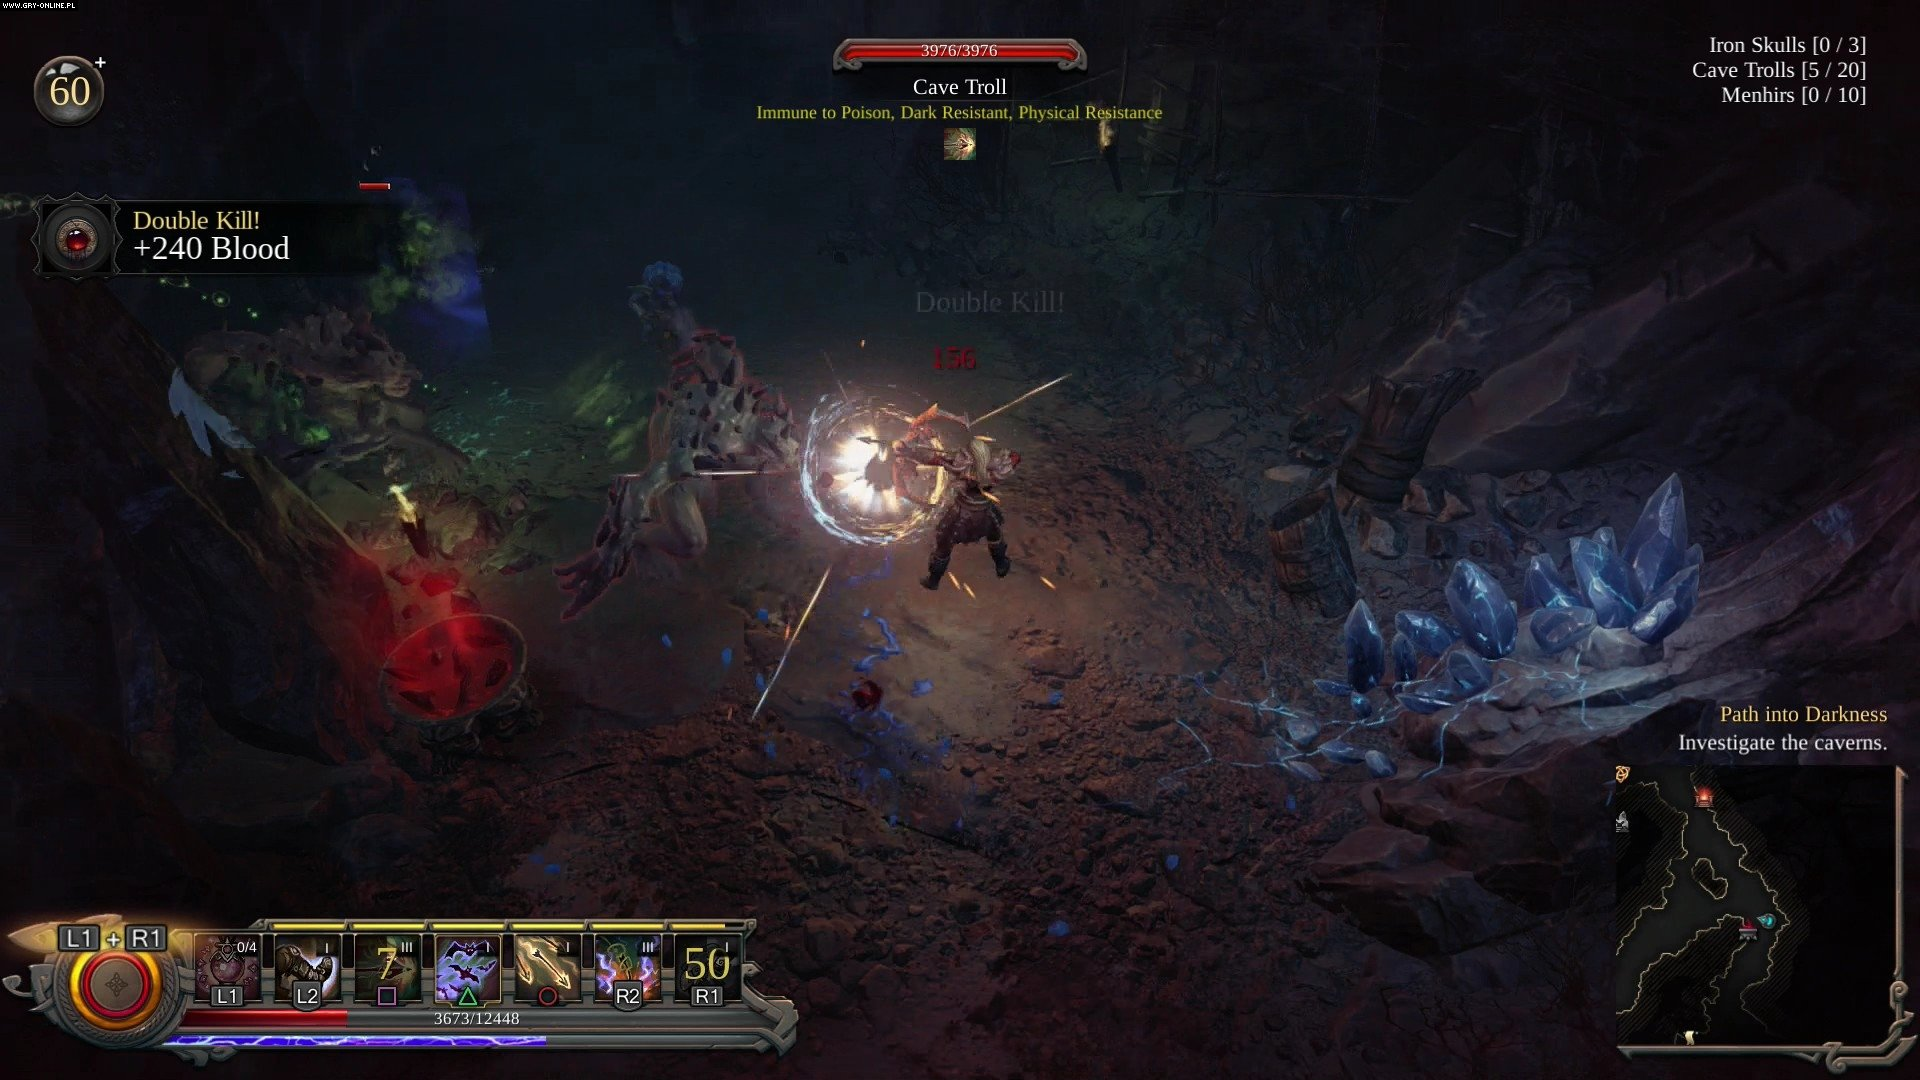 Vikings: Wolves of Midgard PC, PS4, XONE Games Image 3/18, Games Farm, Kalypso Media